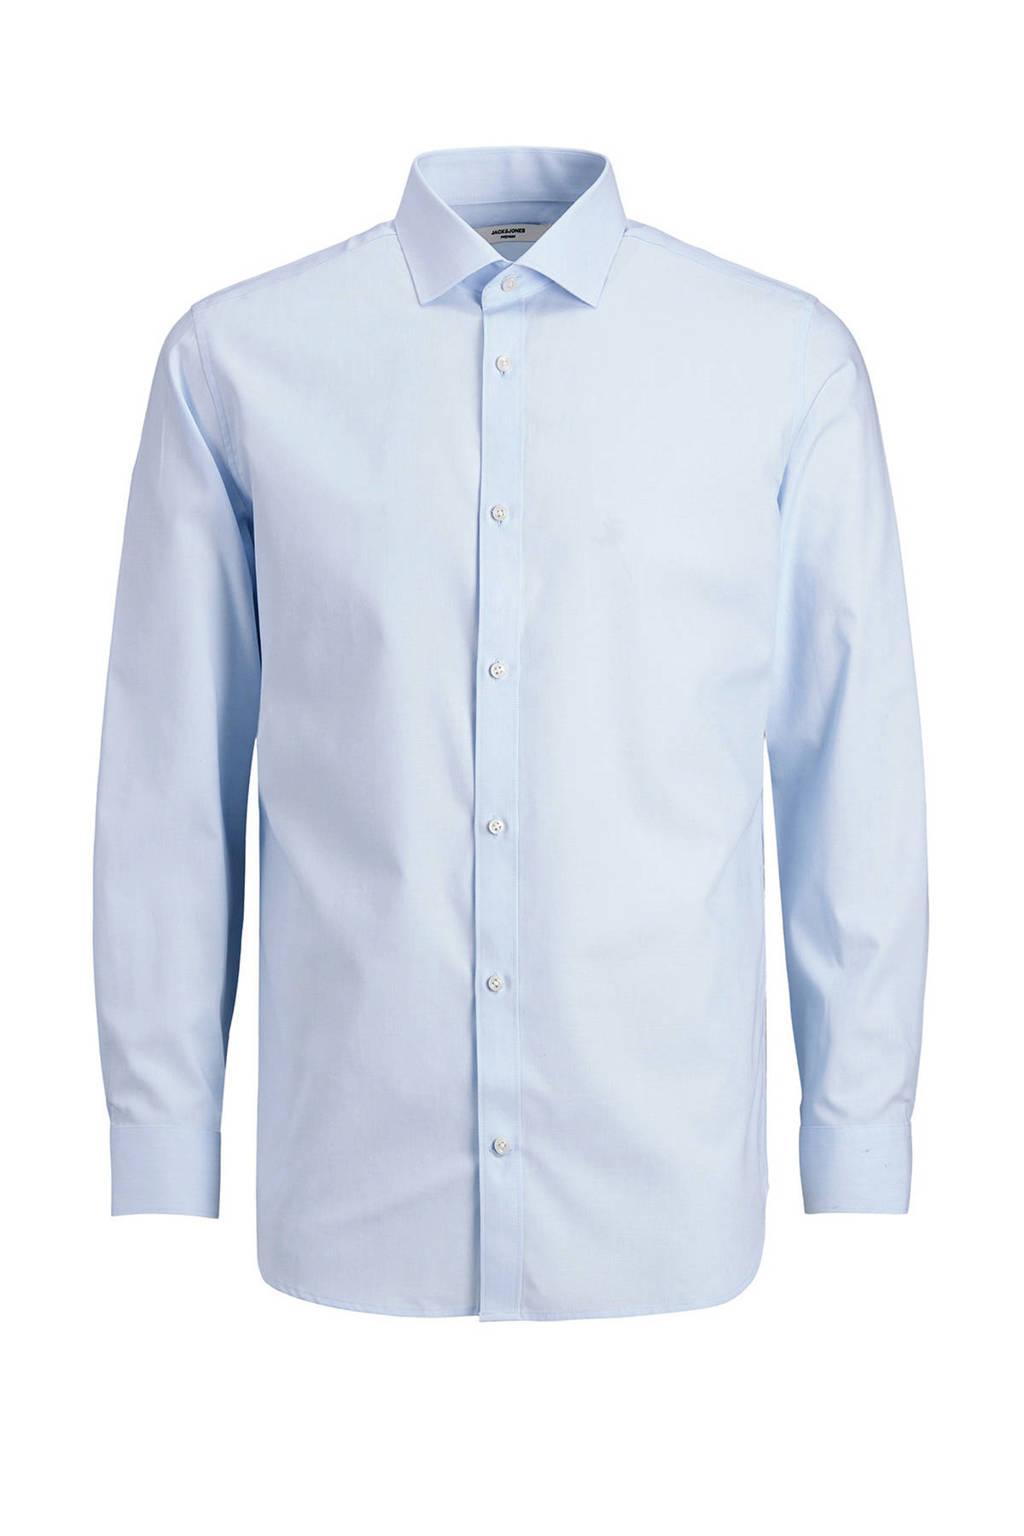 JACK & JONES PREMIUM slim fit overhemd JPRBLAROYAL van biologisch katoen lichtblauw, Lichtblauw